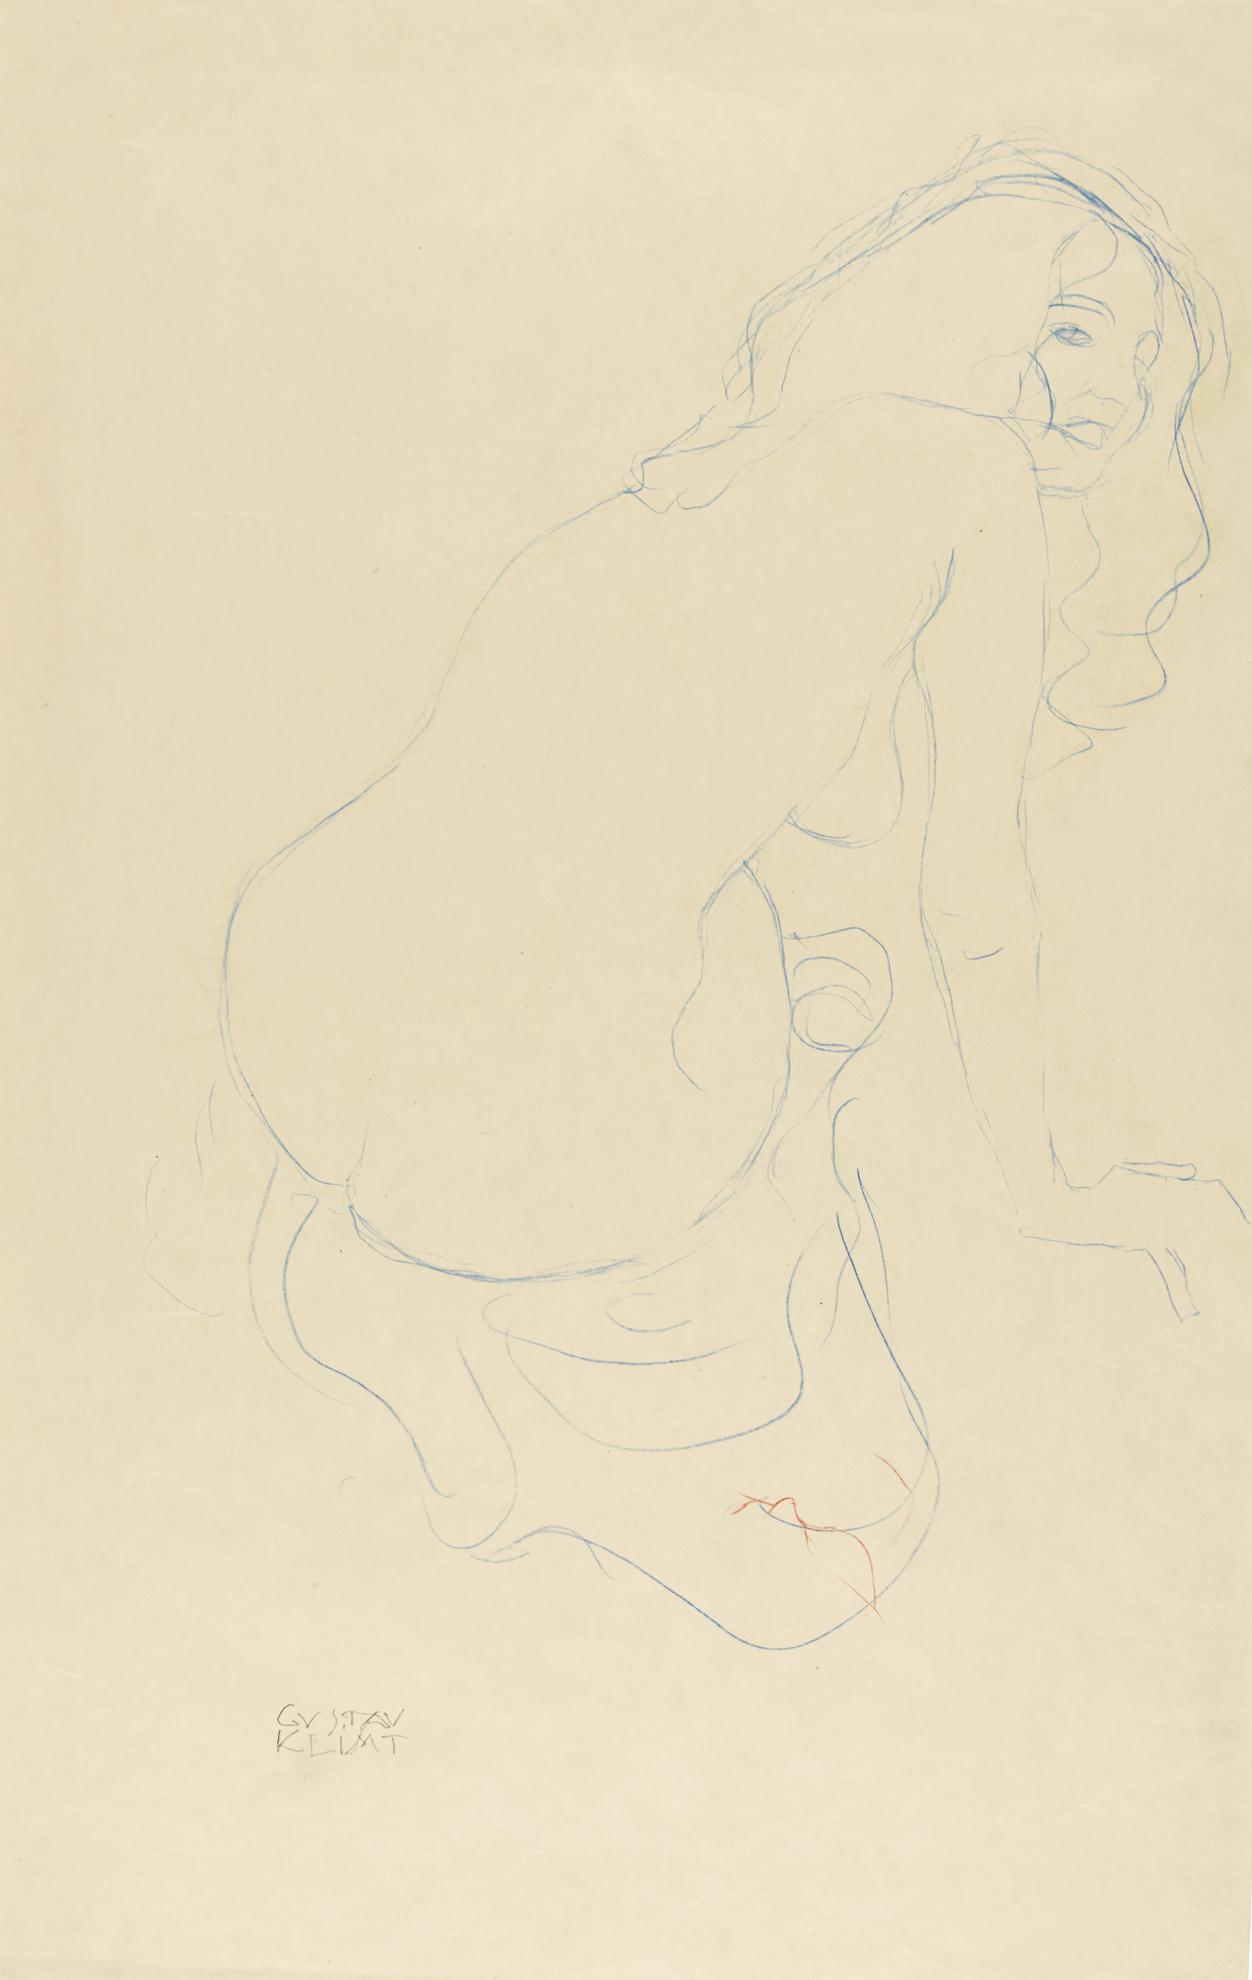 Gustav Klimt-Kauernder Akt Nach Rechts Mit Langen Haaren (Crouching Nude With Long Hair Seen From The Right)-1911